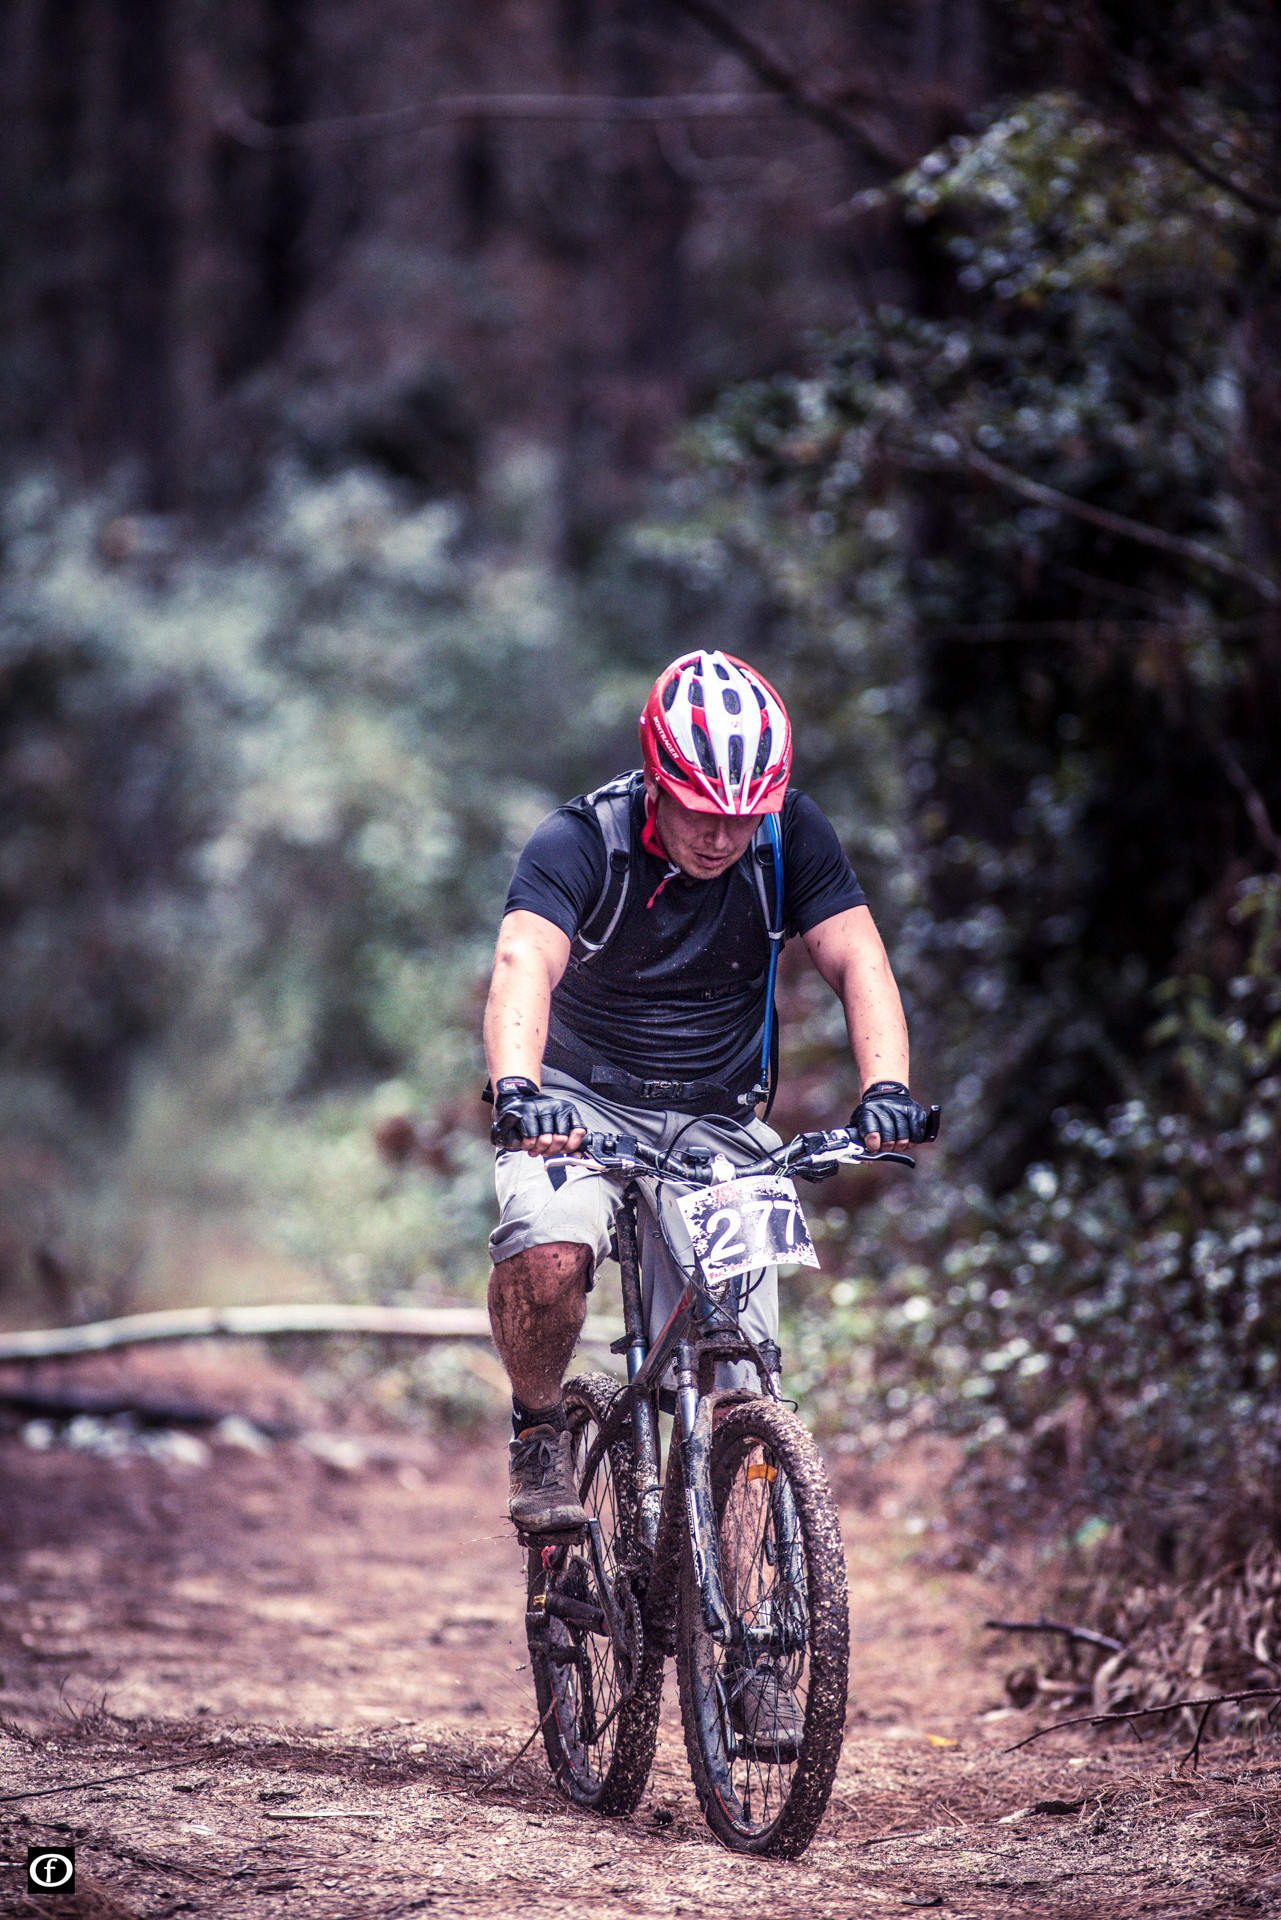 2015-05-17-Ciclismo Enduro-64.jpg